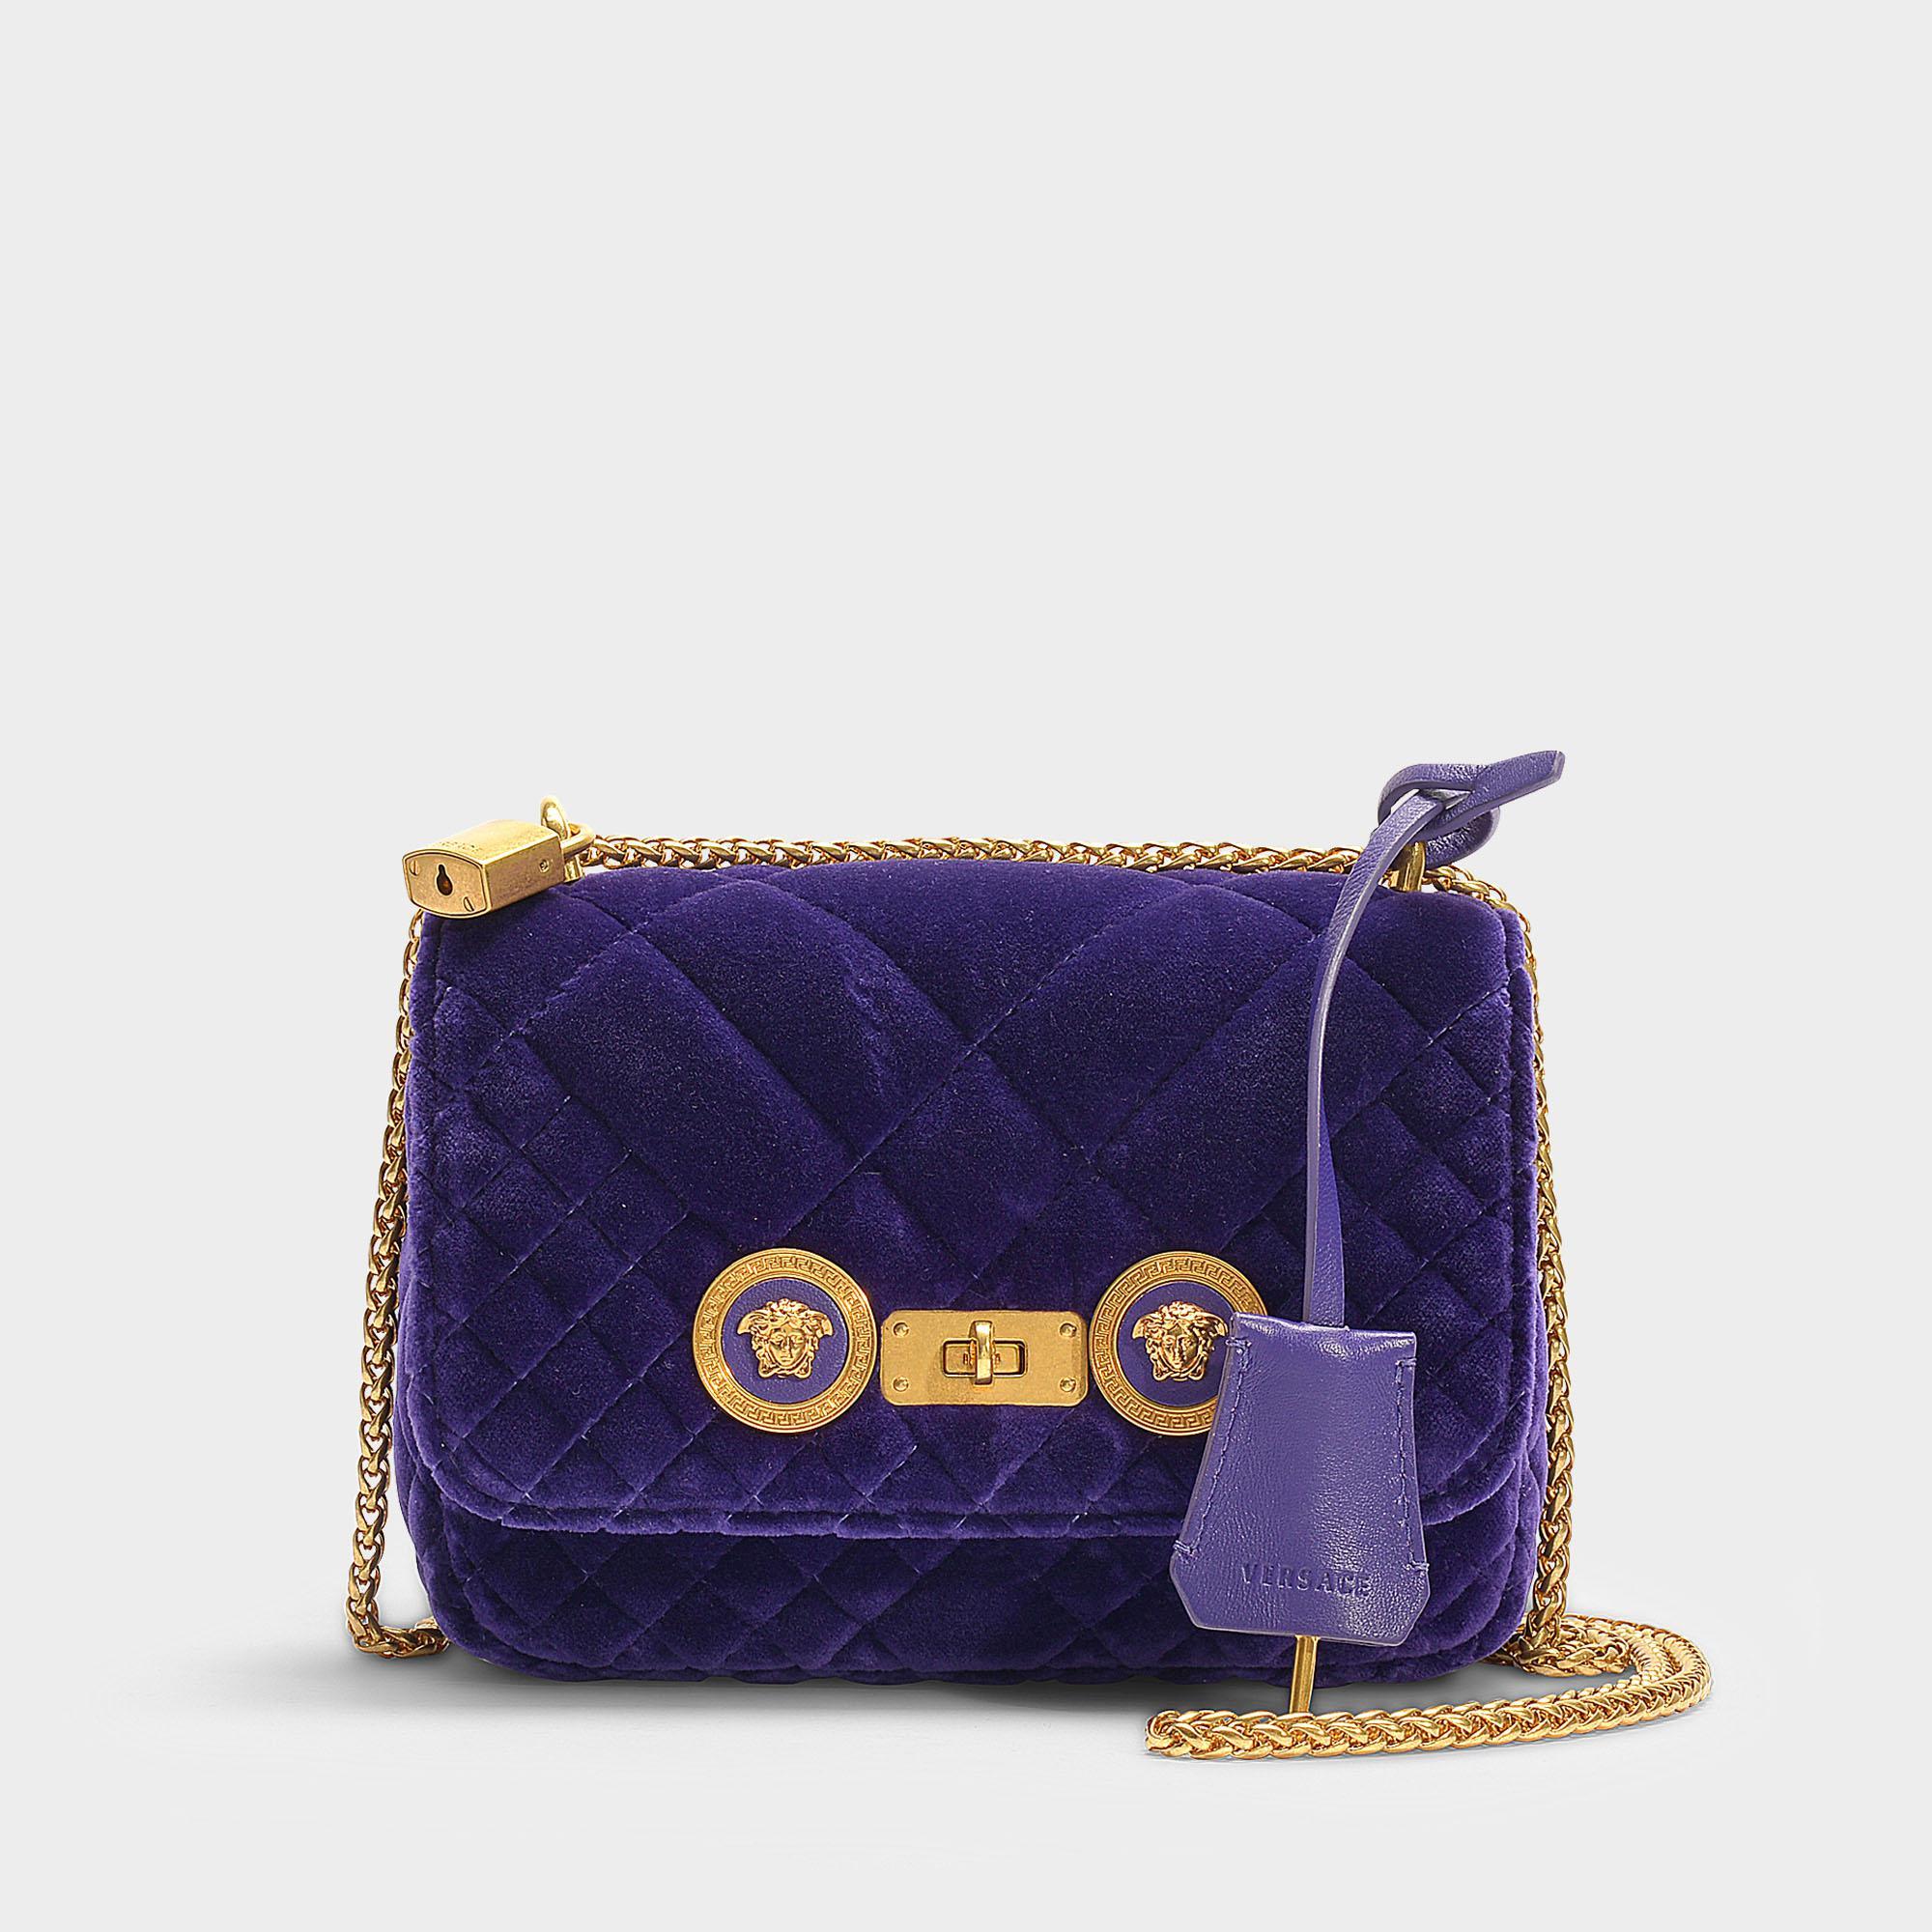 Lyst - Versace Small Icon Shoulder Bag In Purple Velvet in Purple 75db94799fe43